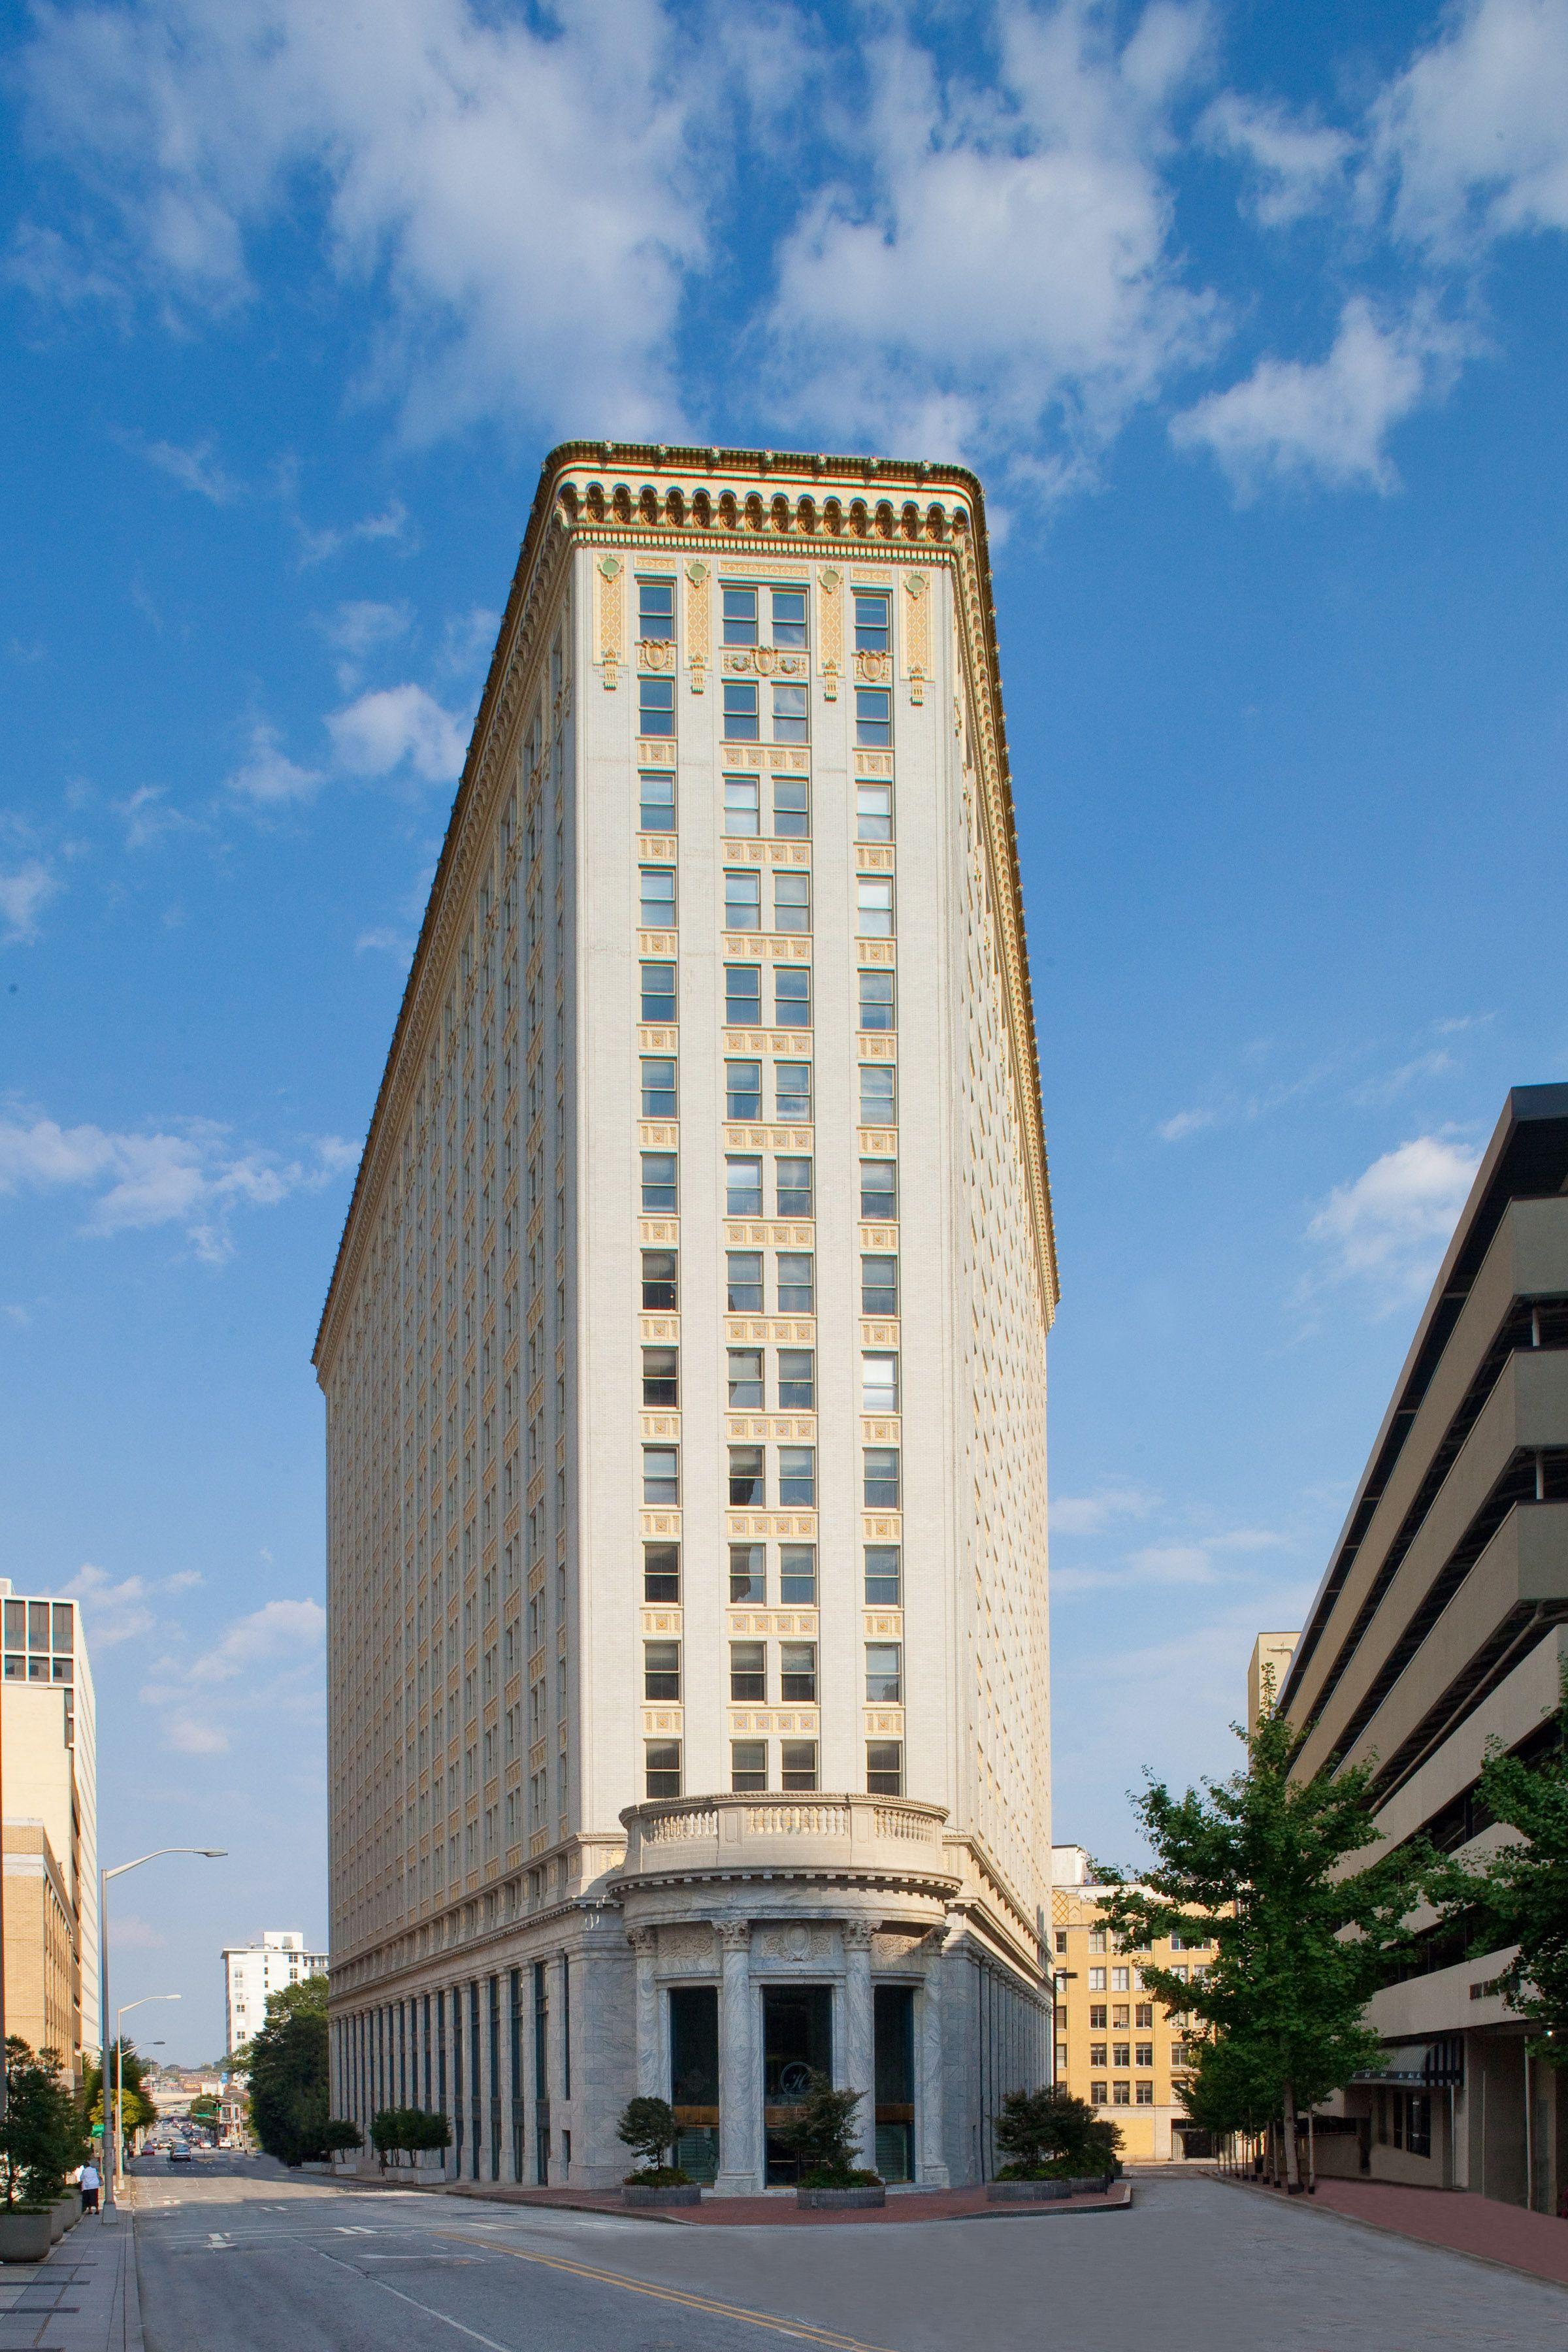 Atlanta, GA. 30303. The elegant Hurt Building is LEED Gold